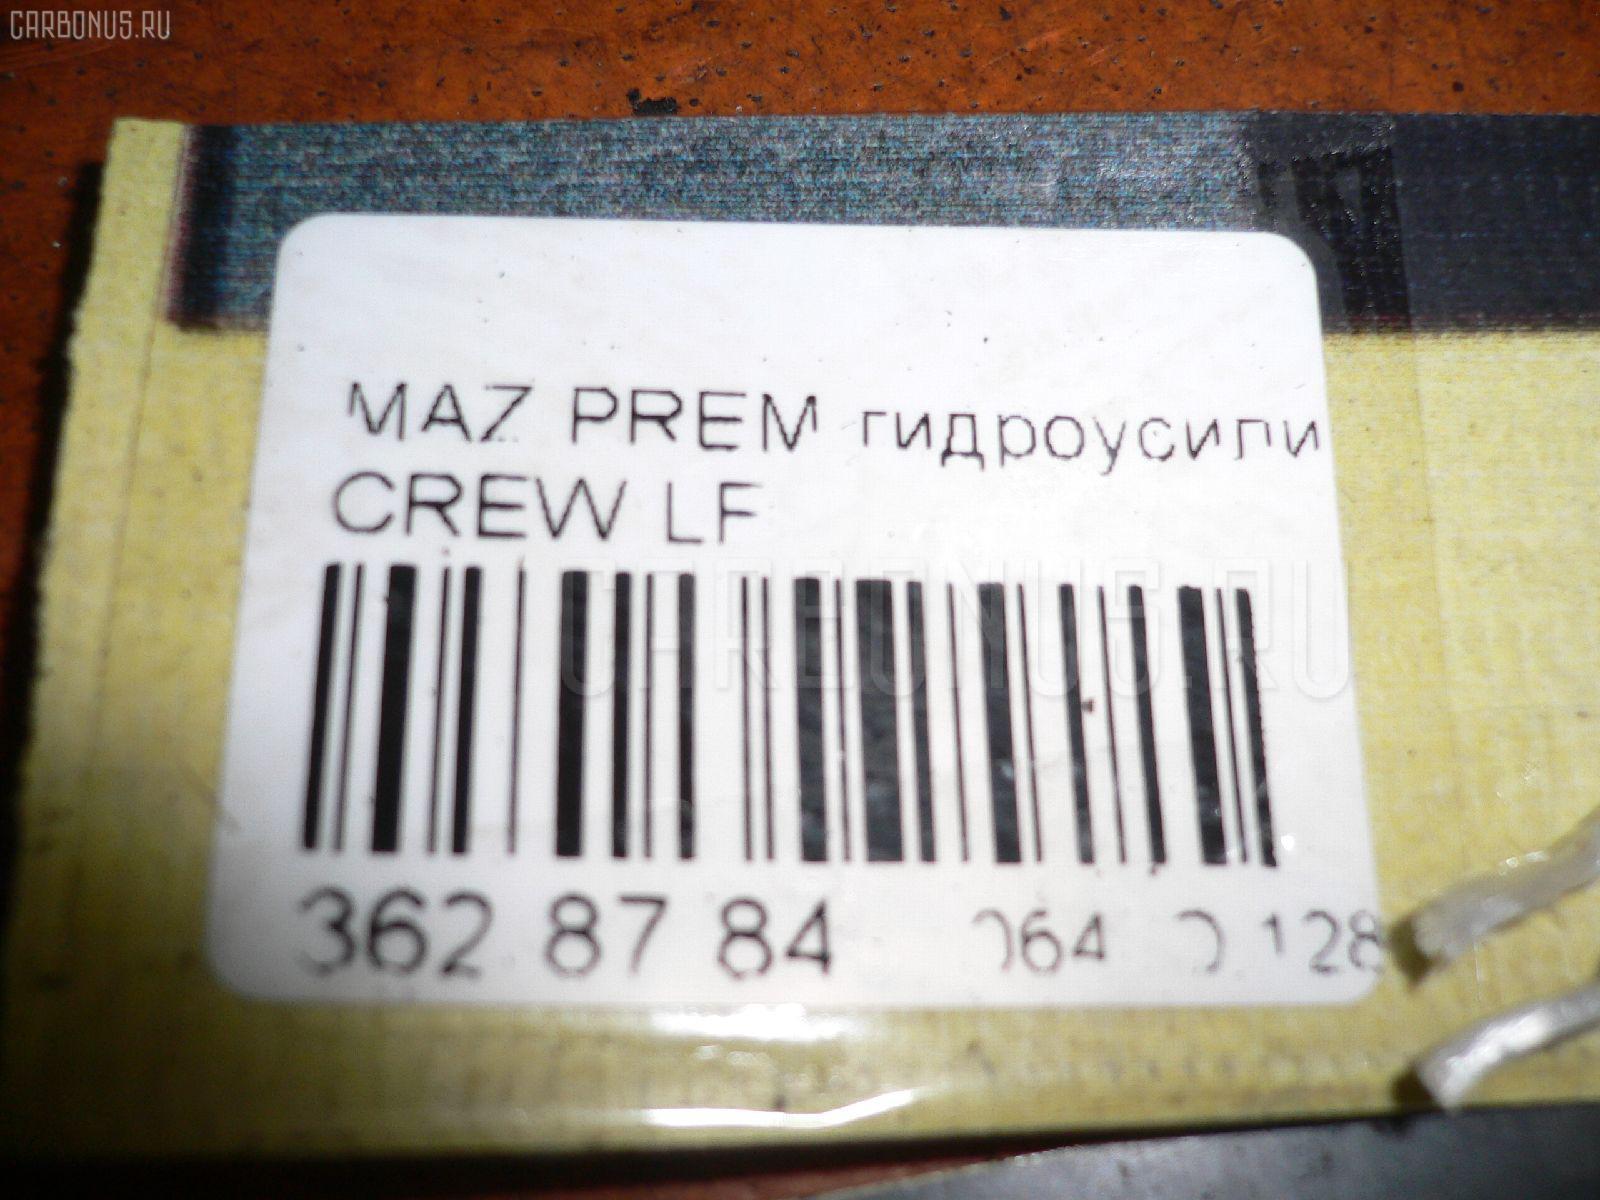 Гидроусилитель MAZDA PREMACY CREW LF Фото 2